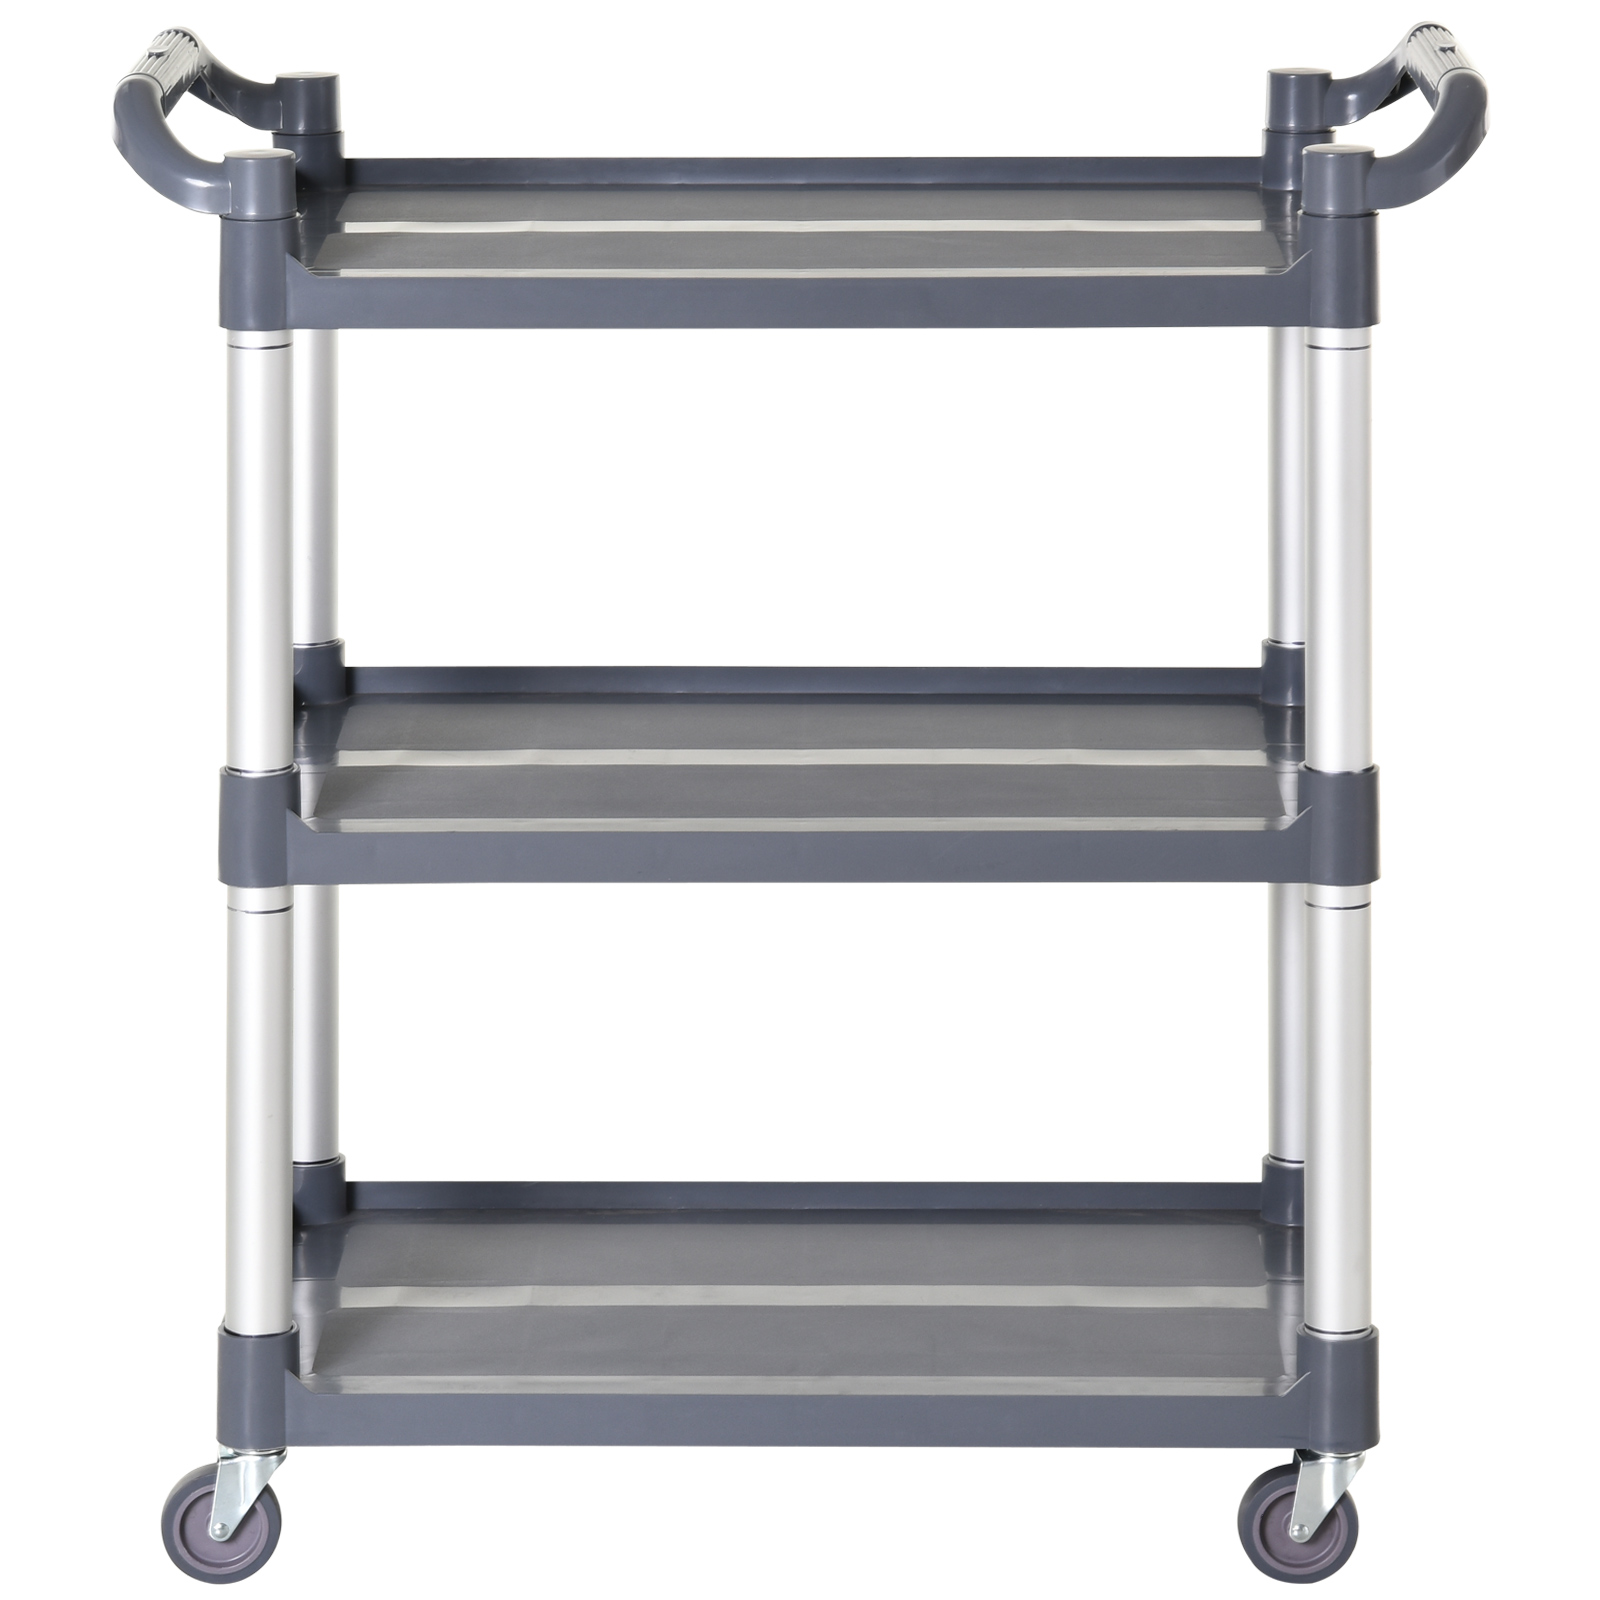 HOMCOM-3-Tier-Metal-Trolley-Serving-Cart-Free-Moving-Kitchen-Livingroom thumbnail 6